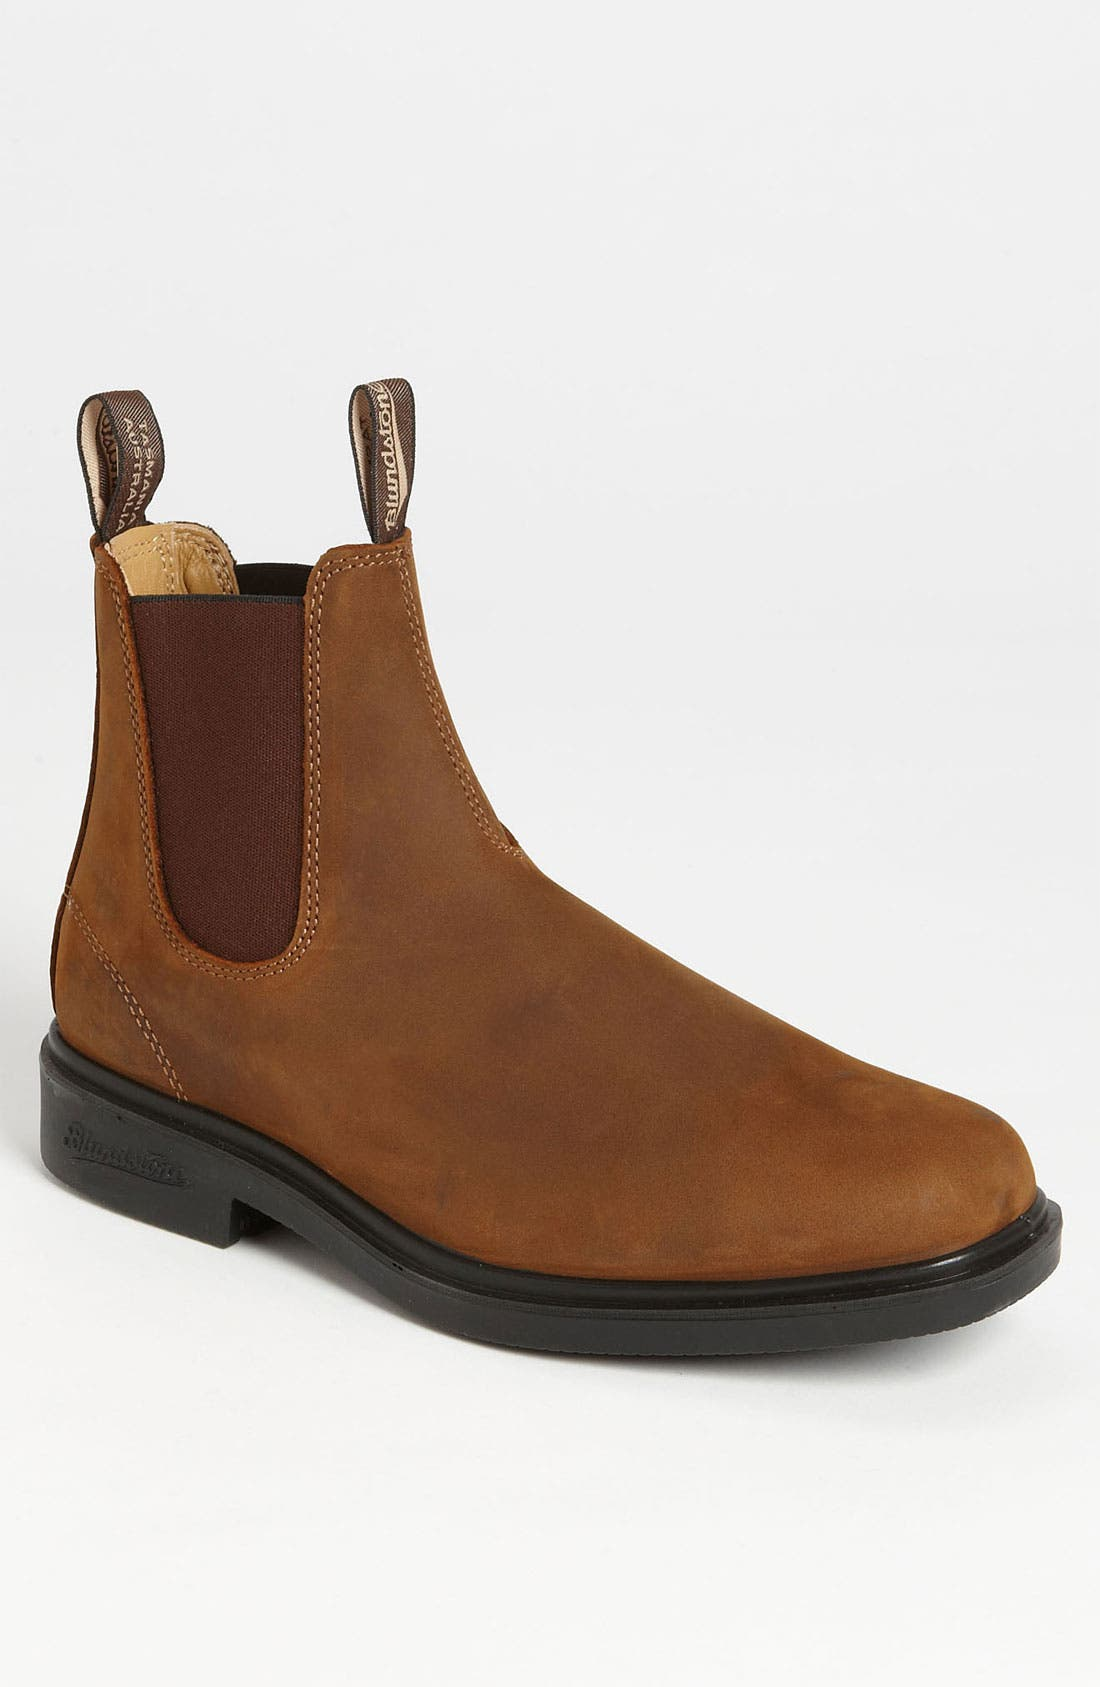 Main Image - Blundstone Footwear Chelsea Boot (Online Only)